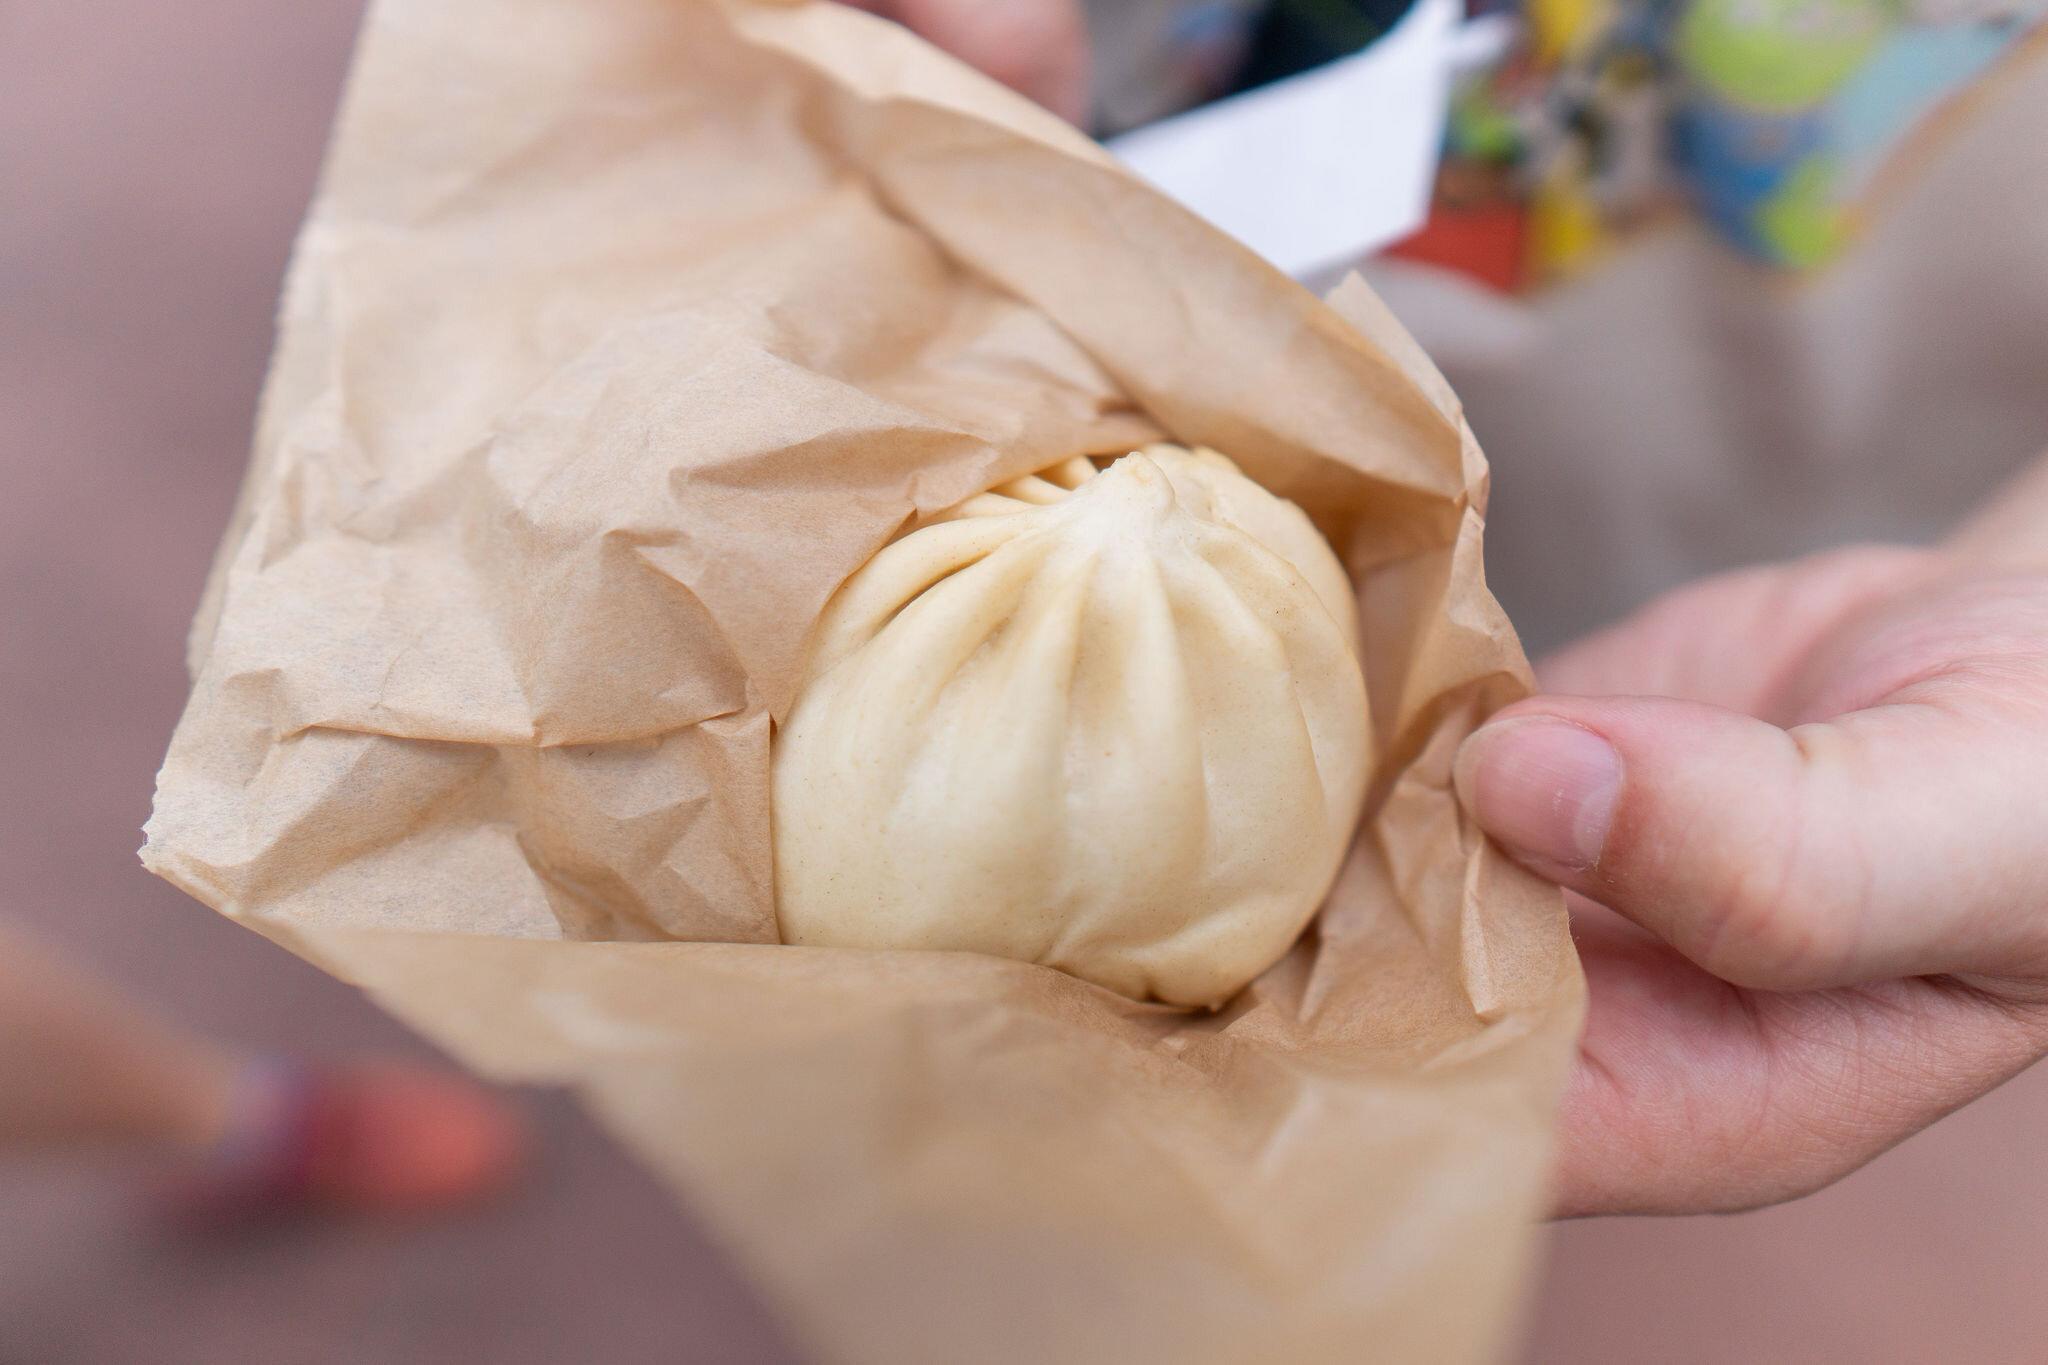 Japan: Teriyaki Chicken Bun: Steamed Bun filled with Chicken, Vegetables and a Sweet Teriyaki Sauce